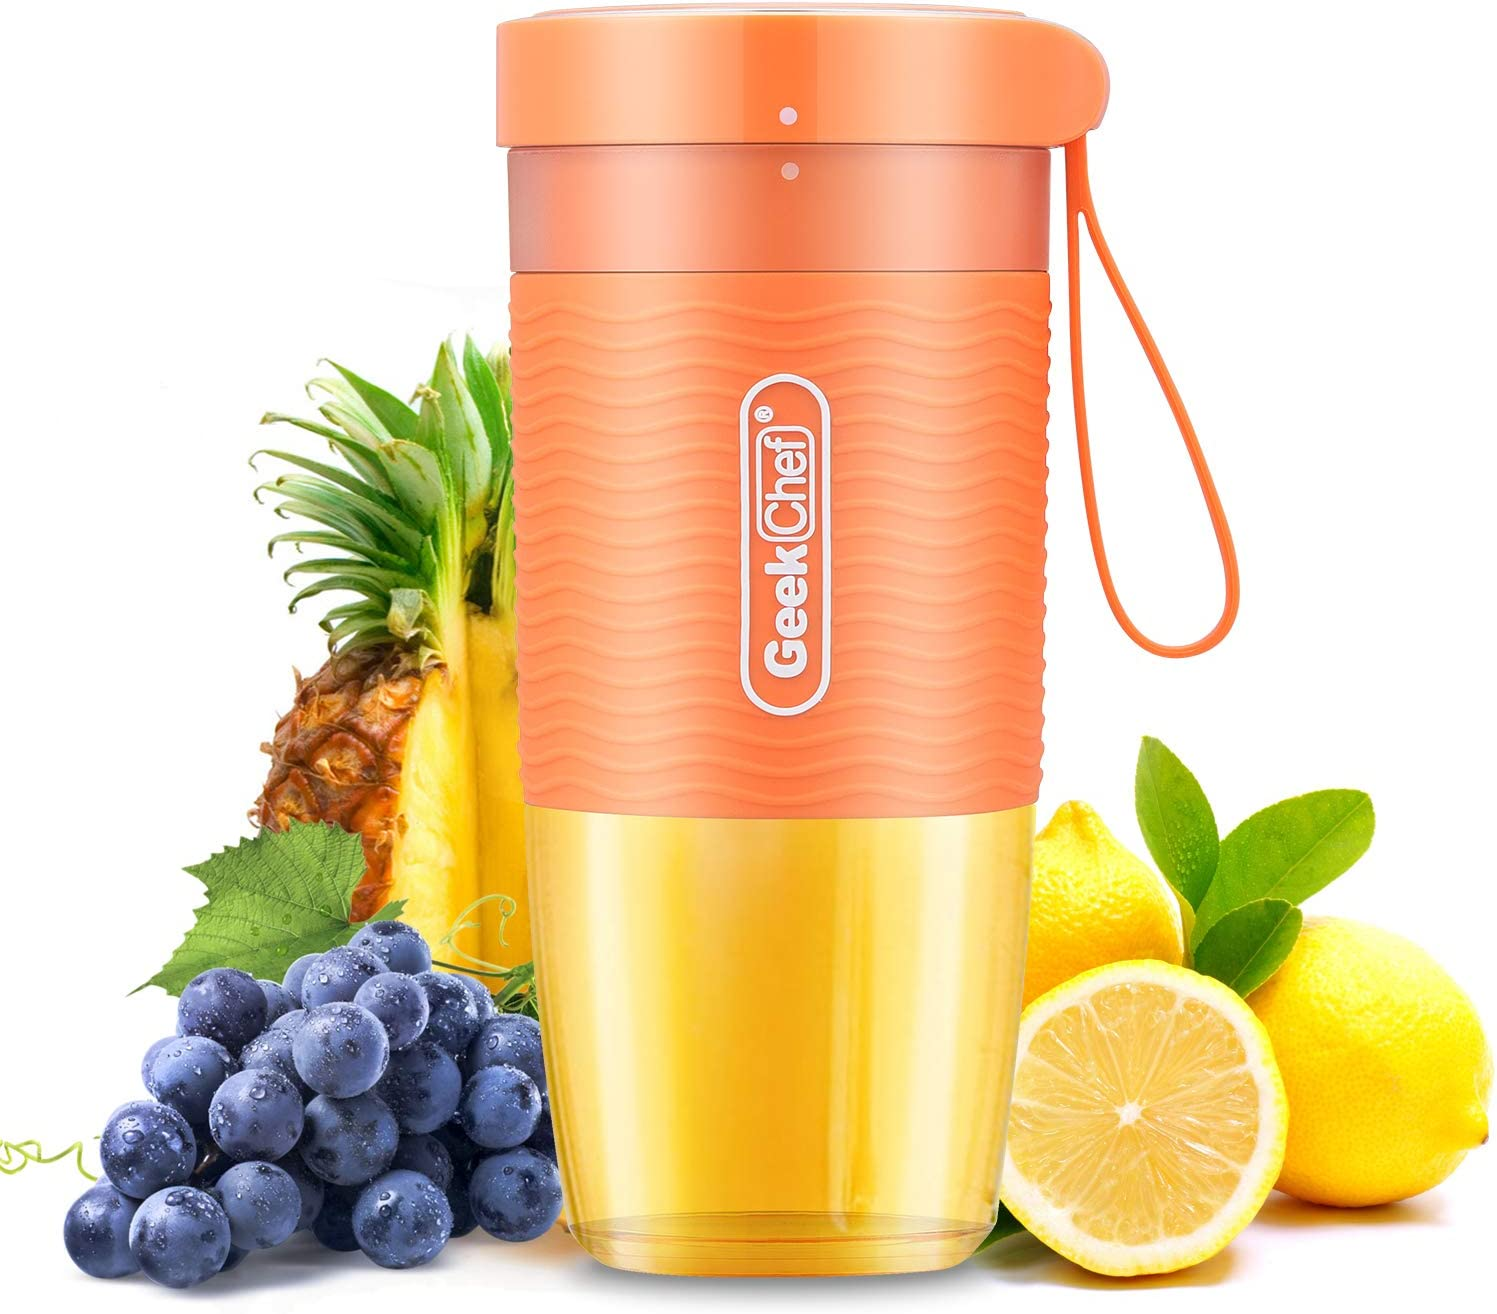 Geek Chef Portable Blender Mini Personal Blender Small Smoothie and Shakes Blender Cordless Small Blender Cup, USB Rechargeable Travel Blender BPA-Free Tritan,10oz/300ml, Orange